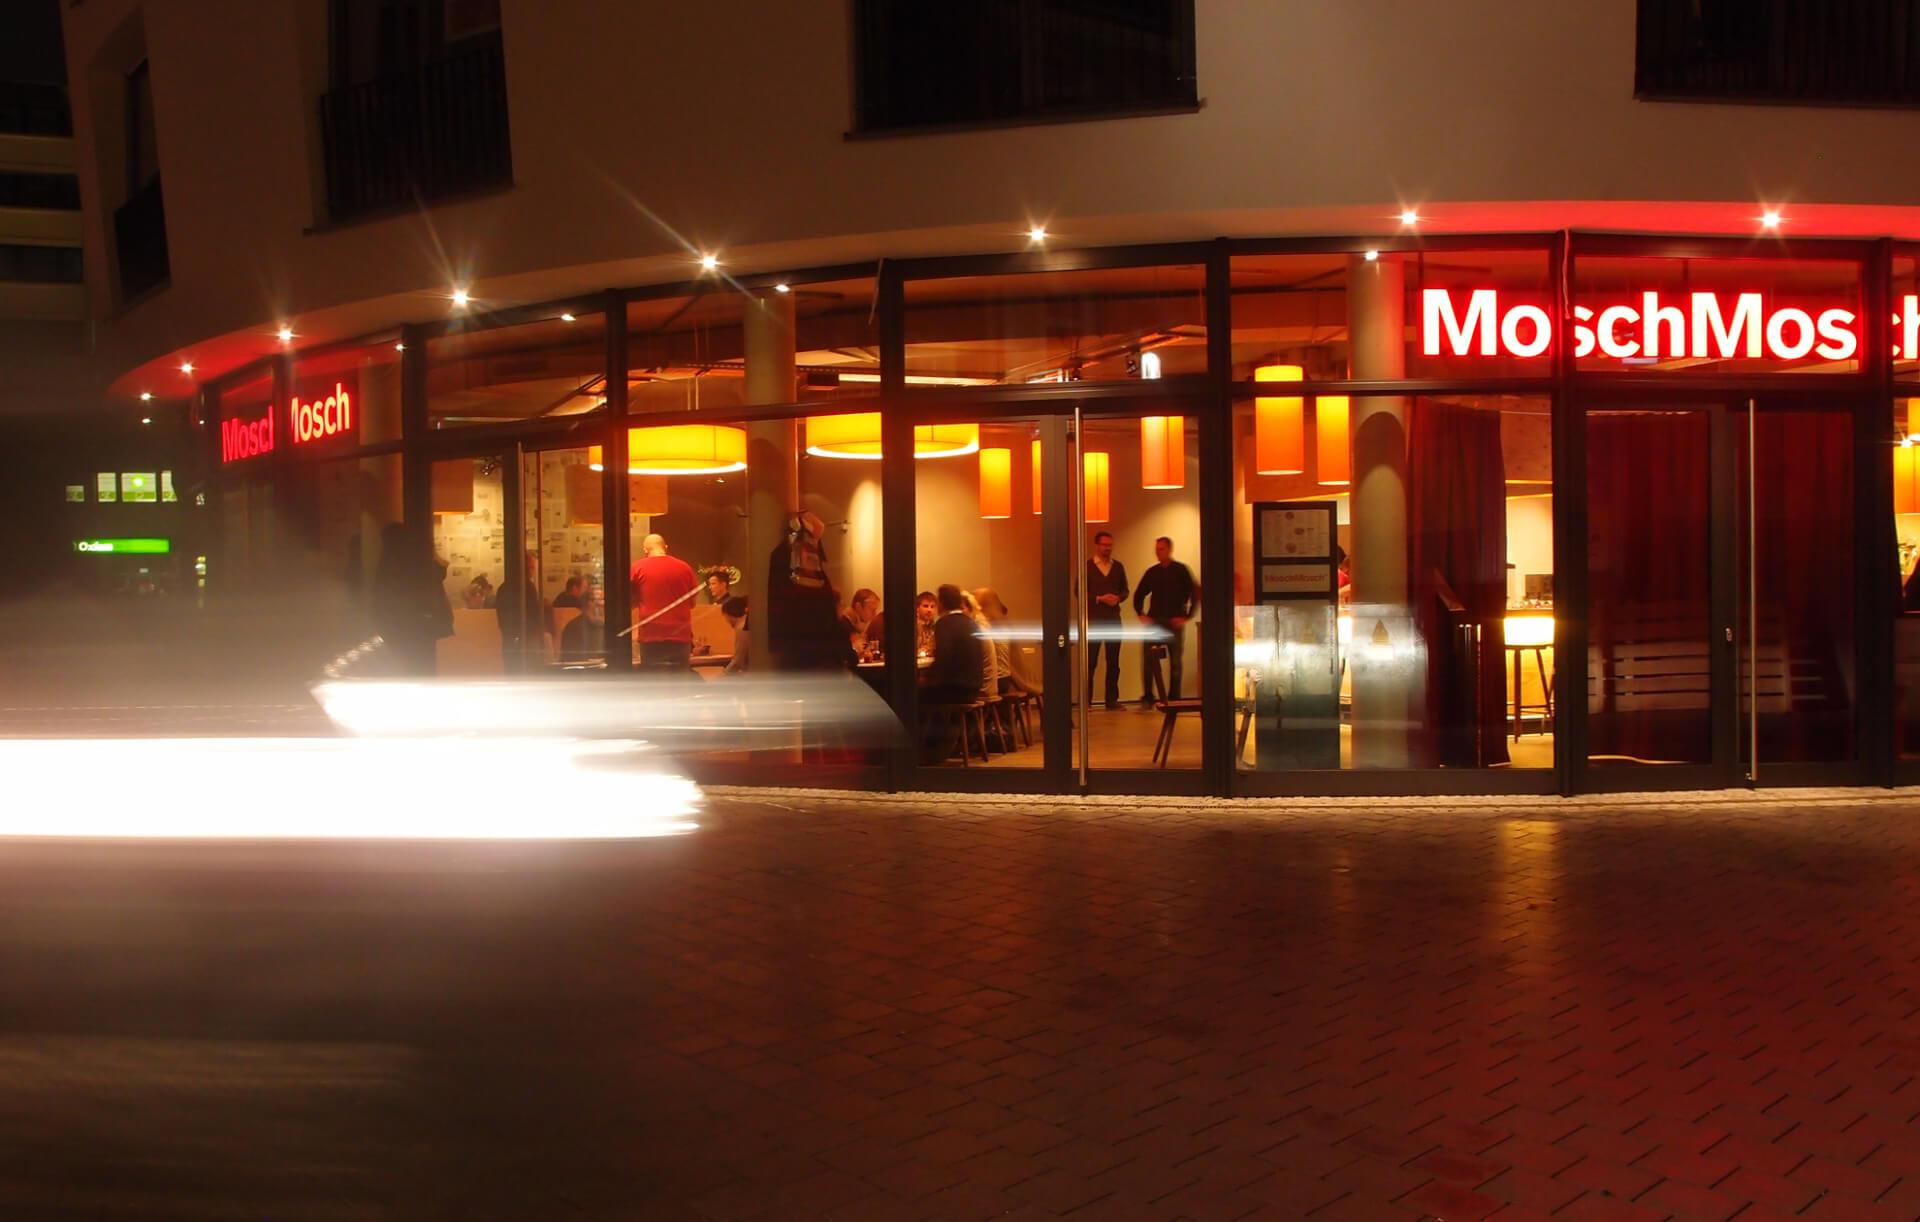 modern restaurant, view from street